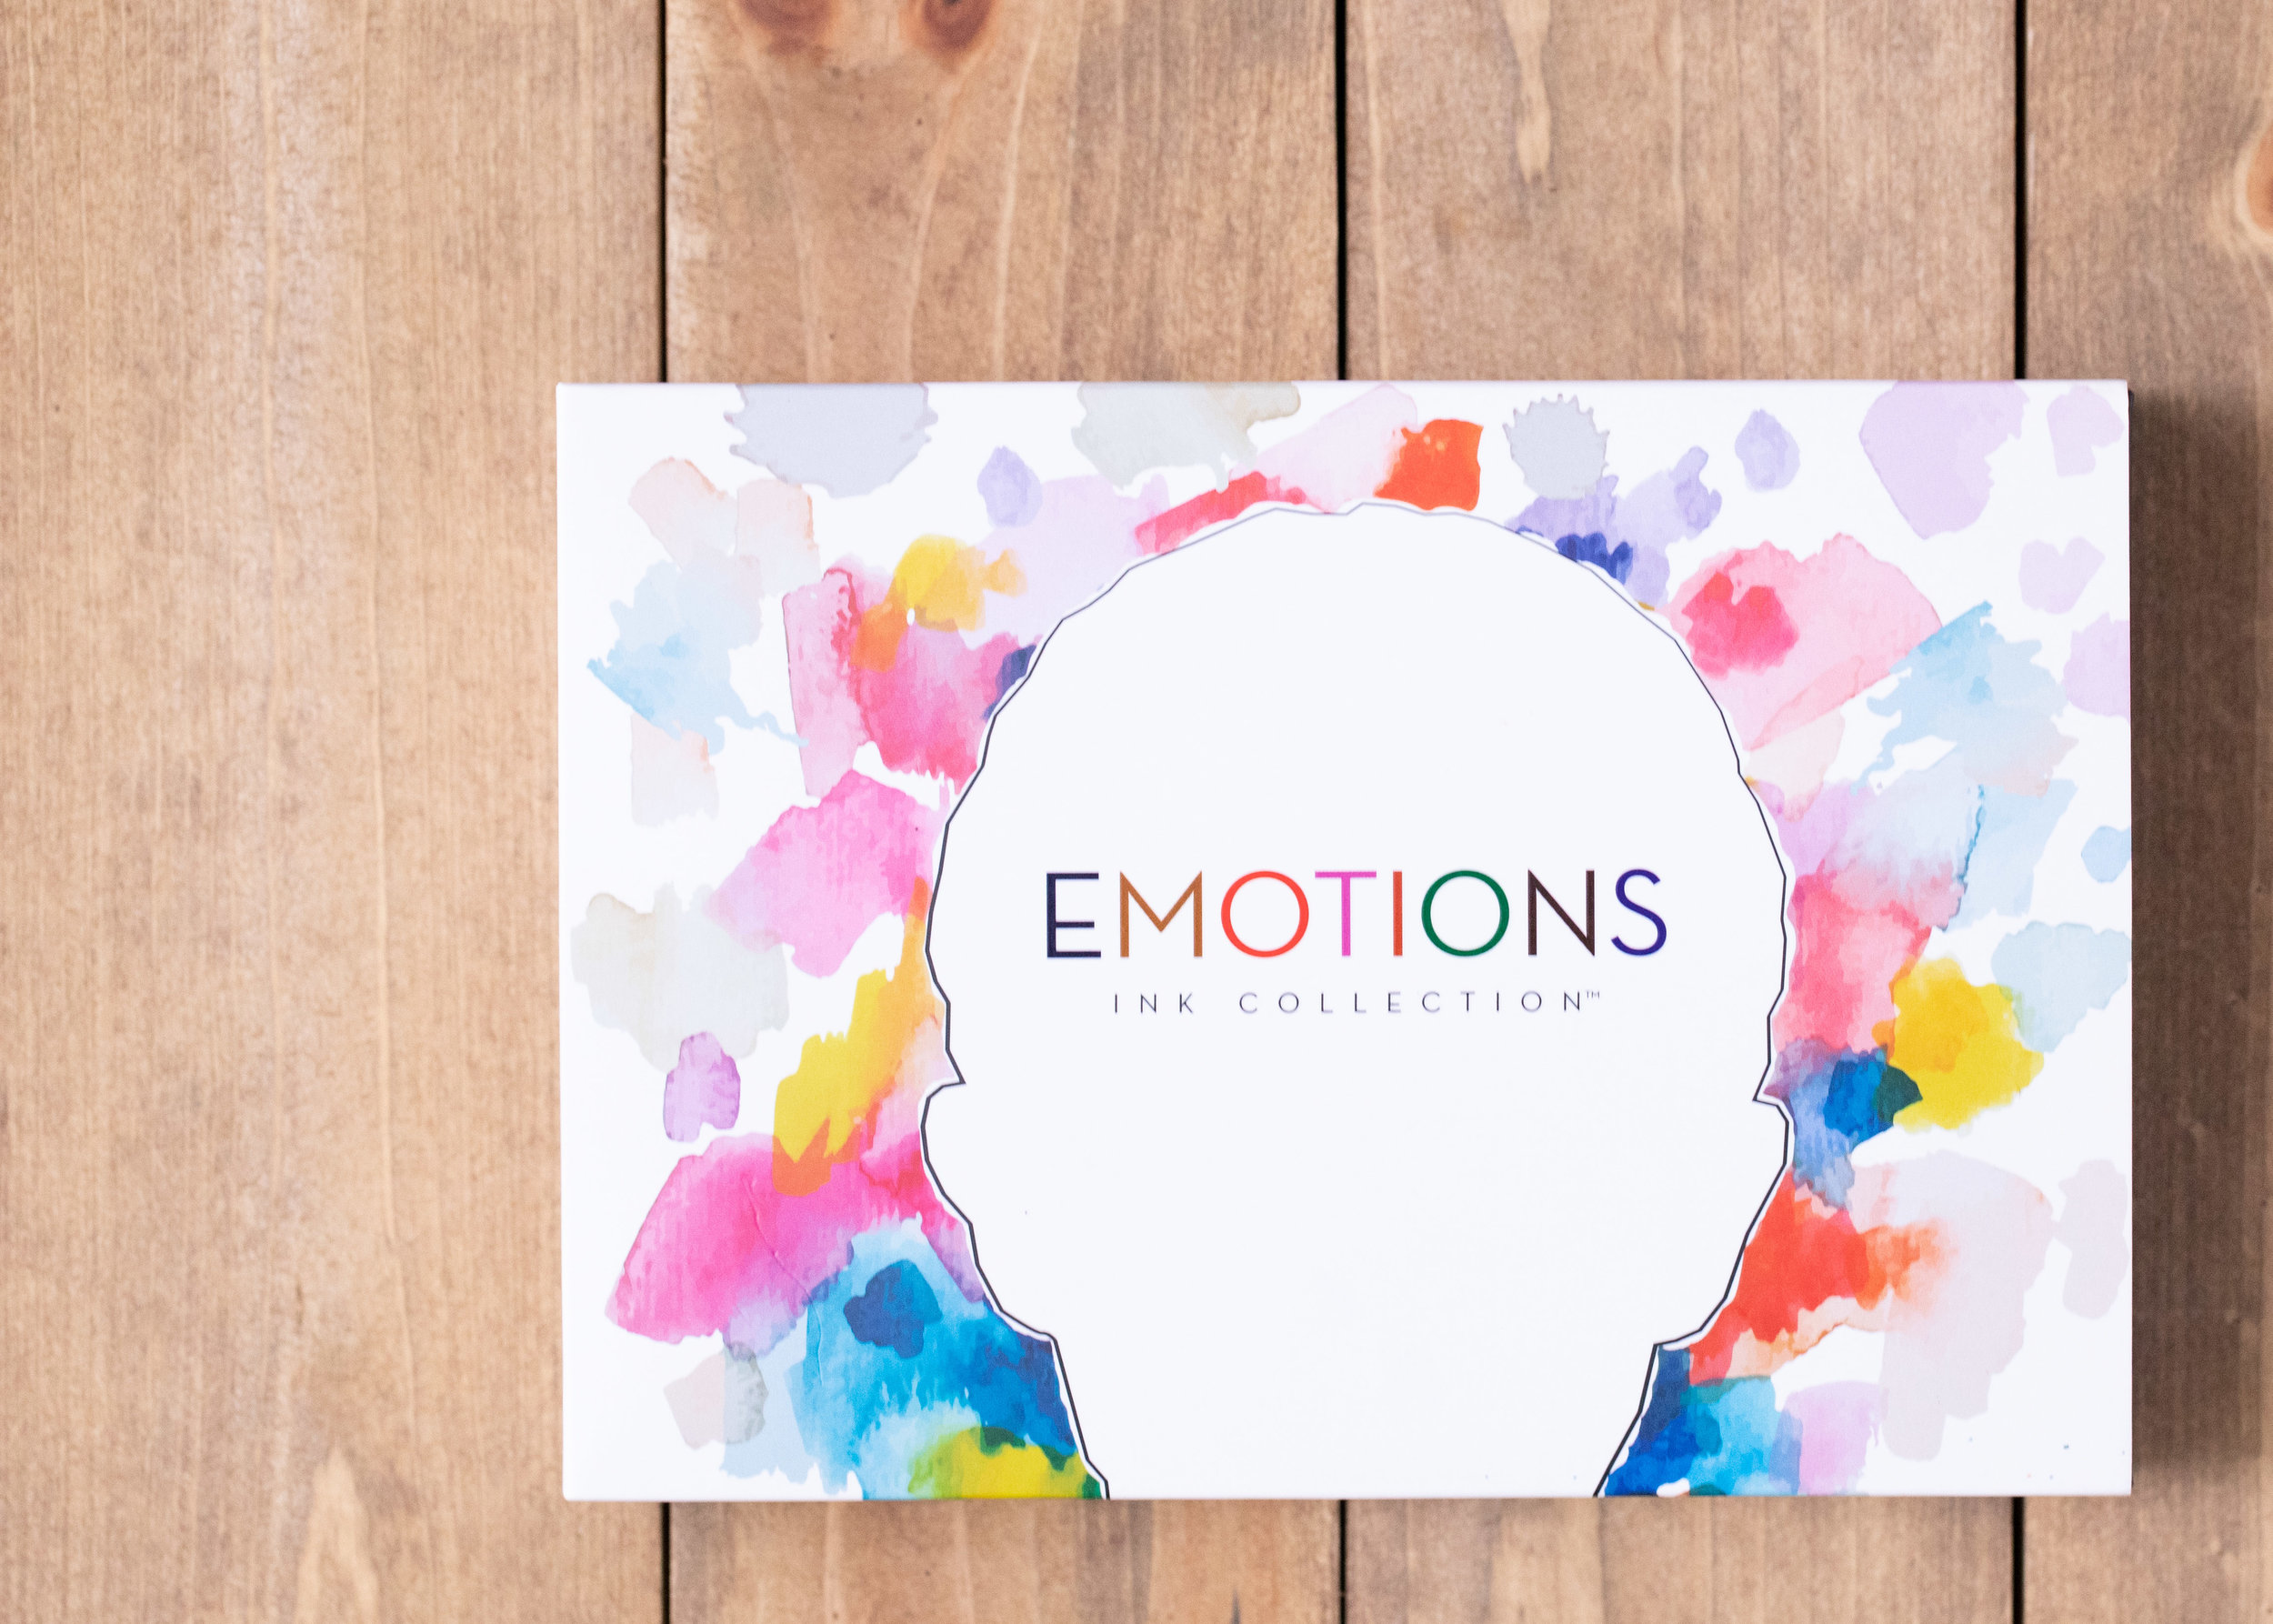 mv-emotions-4.jpg